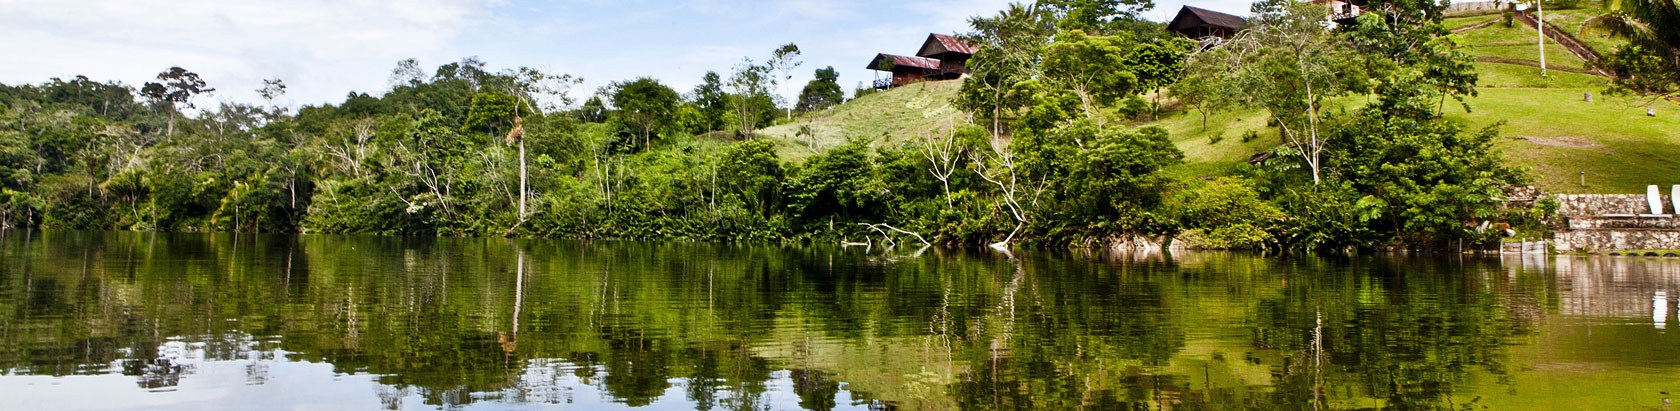 Lago Lindo © Gihan Tubbeh / PromPerú